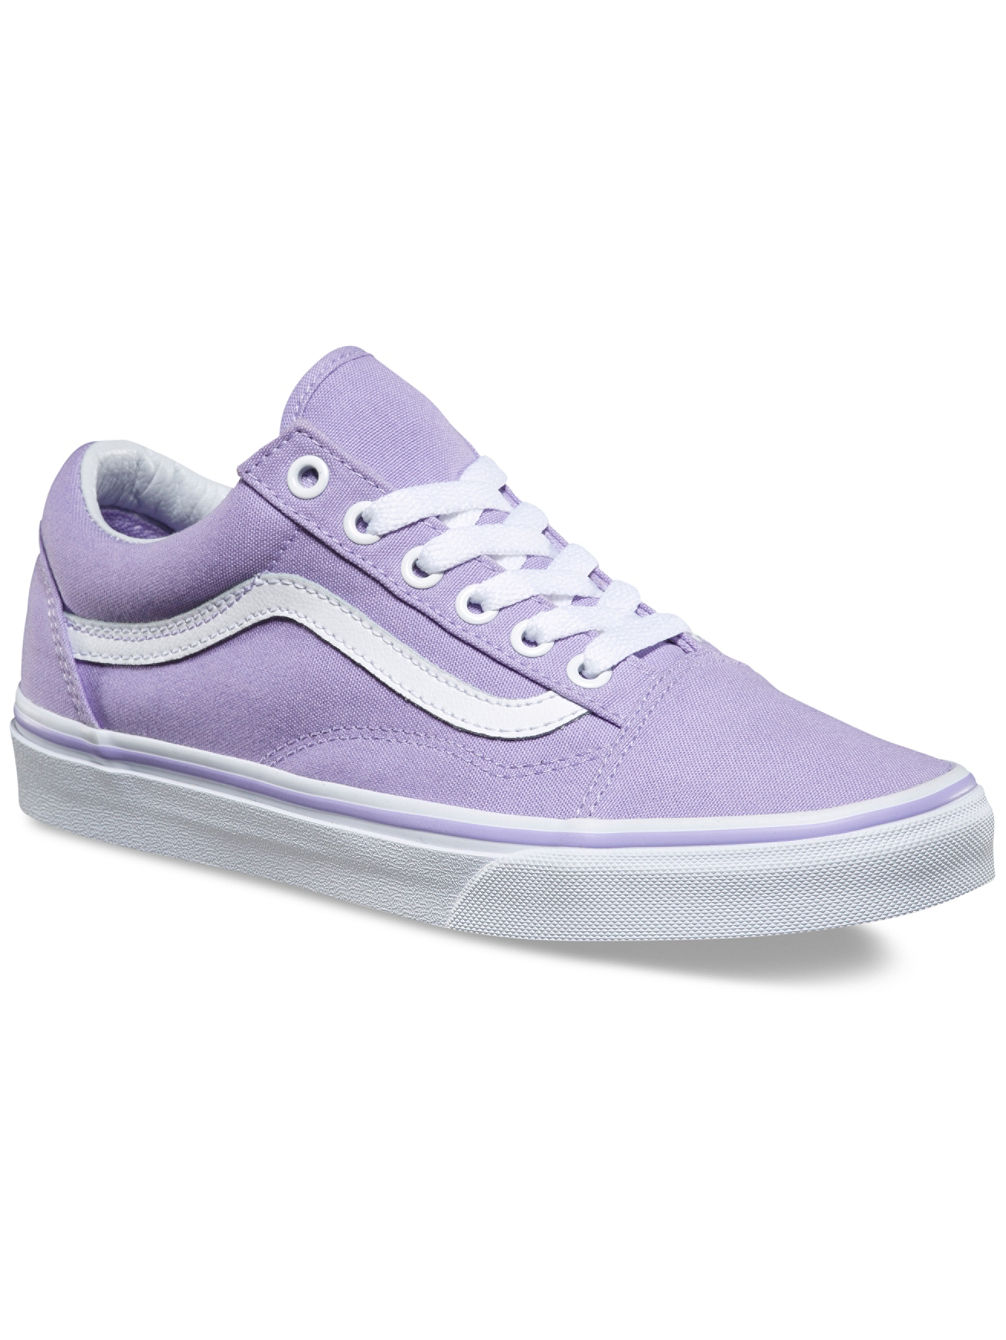 Buy Vans Old Skool Sneakers Women online at blue-tomato.com d22ad784a